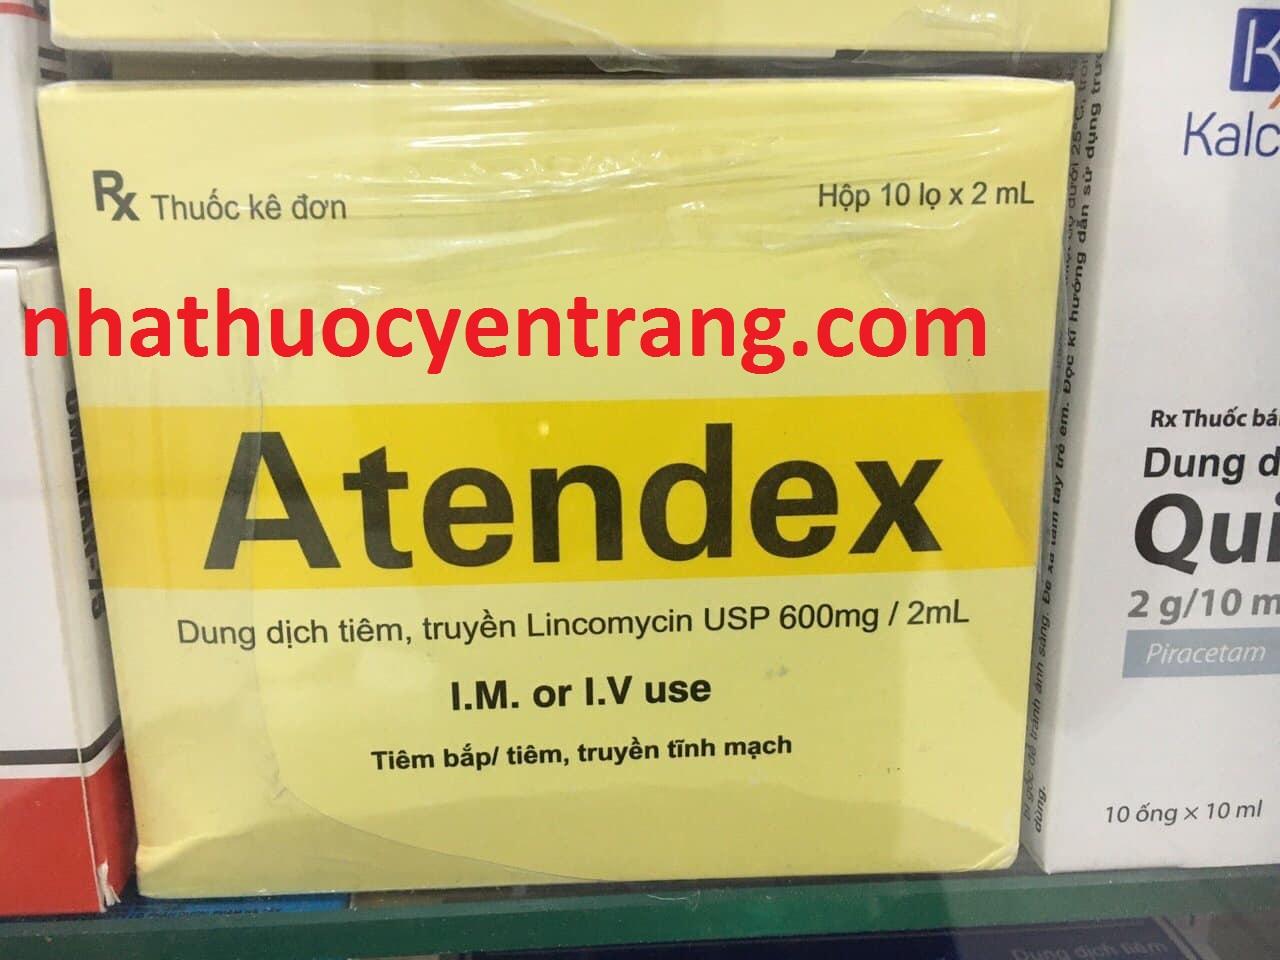 Atendex